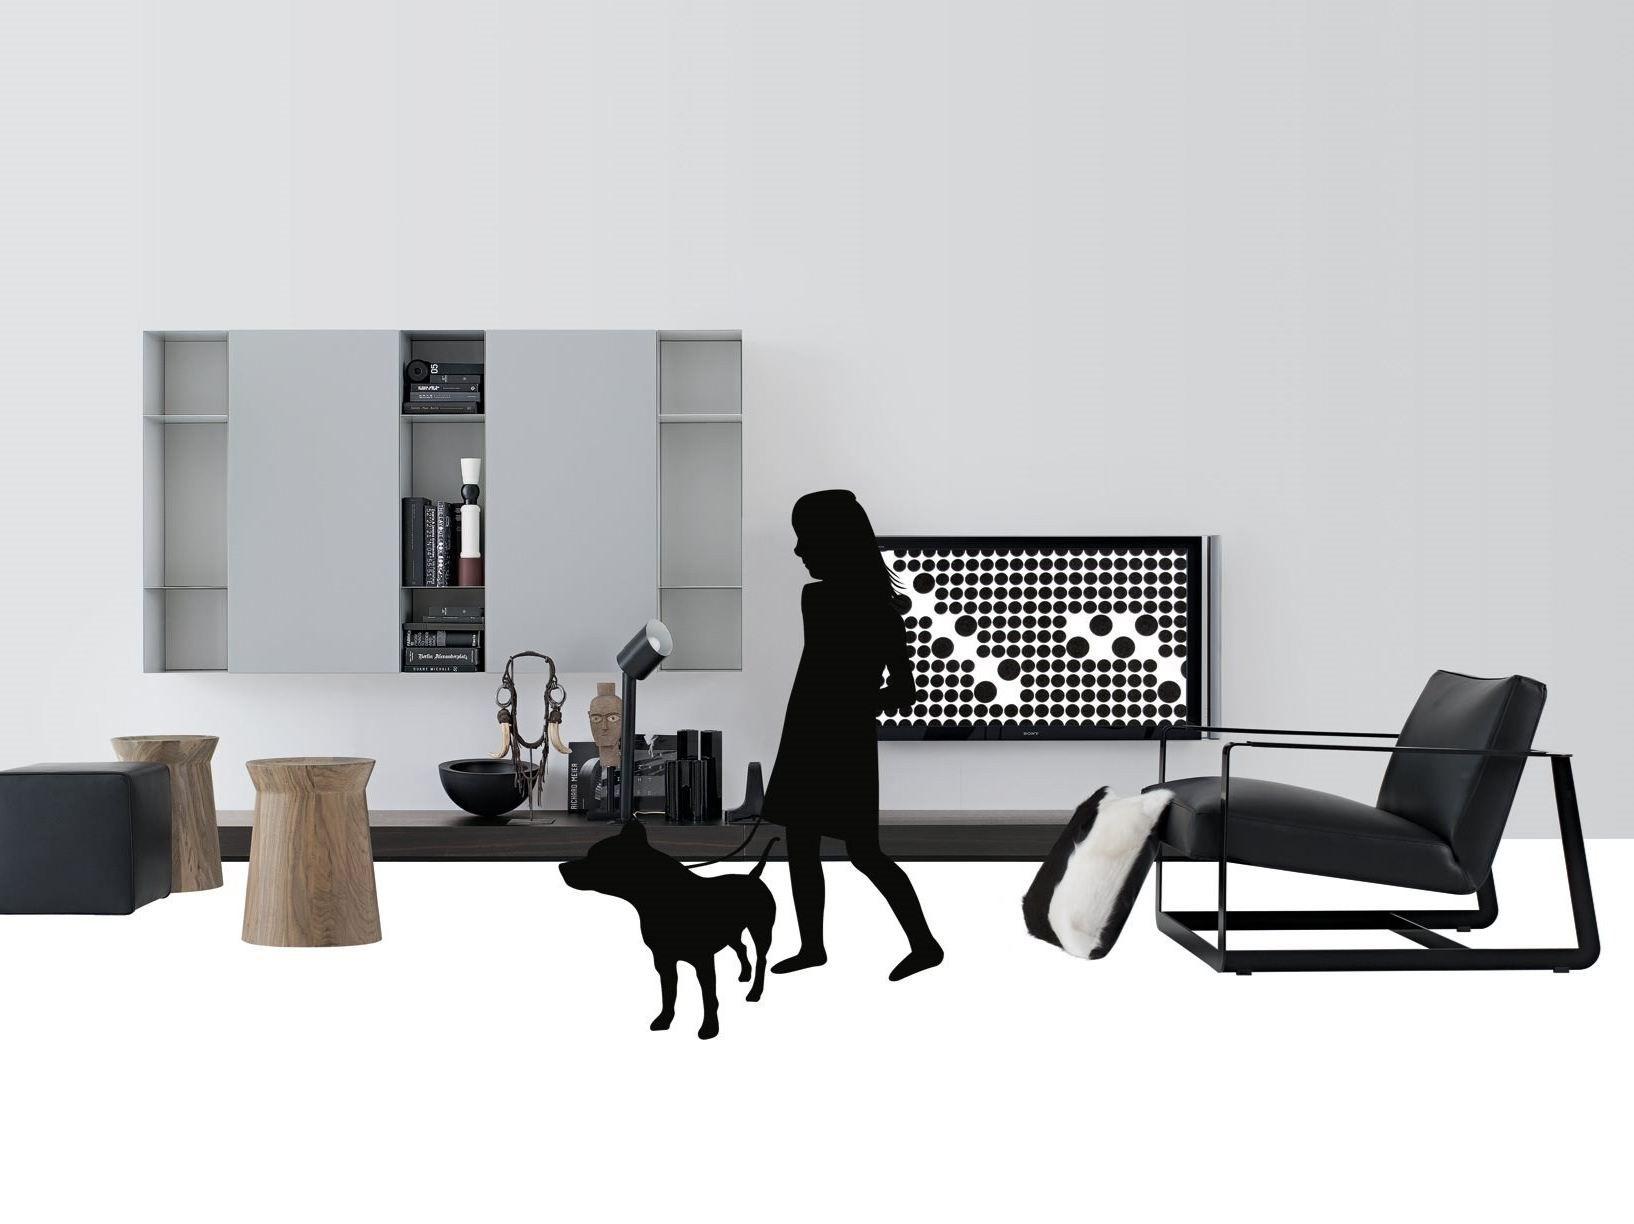 Ensemble Mural Composable Laquee Avec Support Tv Sintesi By Poliform